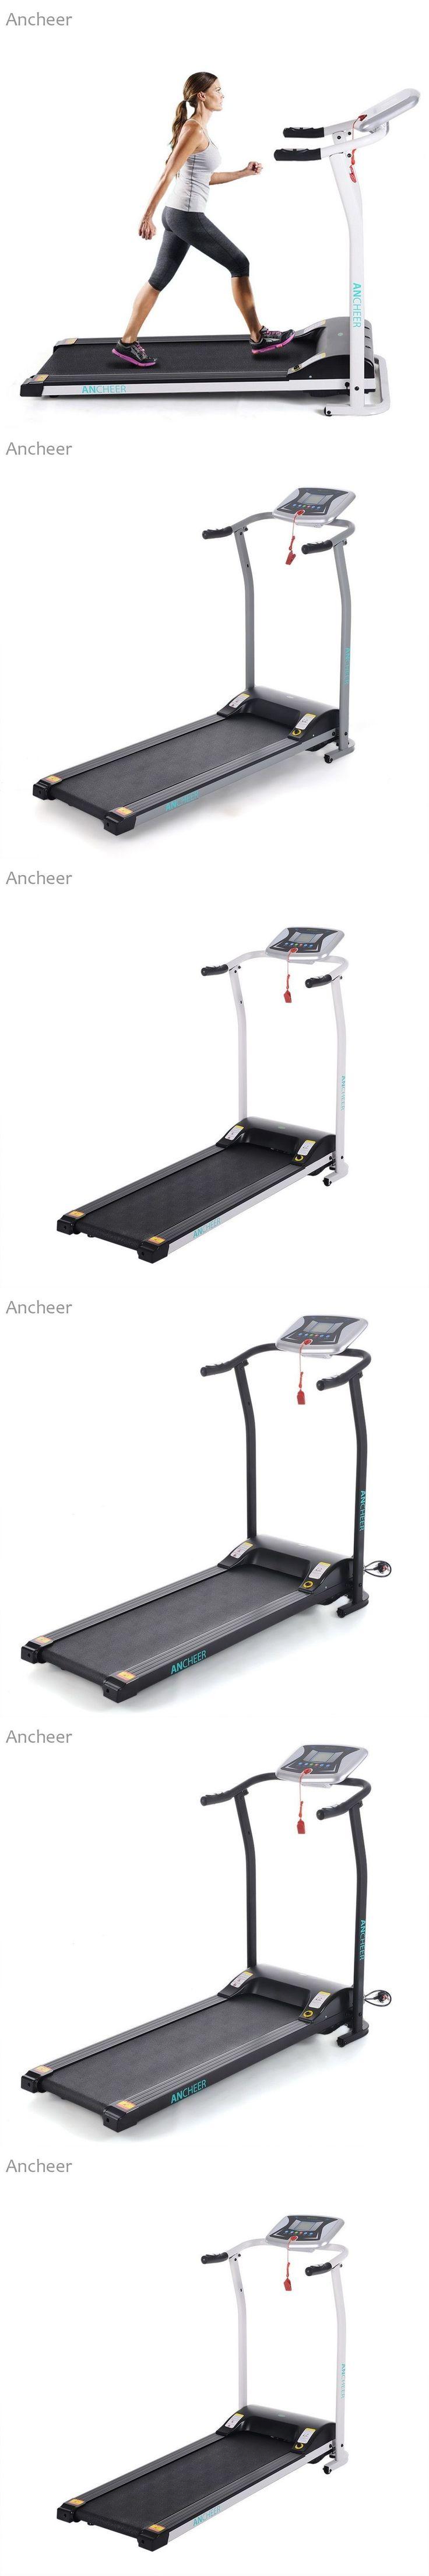 ANCHEER New Electric Treadmill Mini Folding Electric Running Training Fitness Treadmill Home EU US Plug sports fitness #trainingfitness